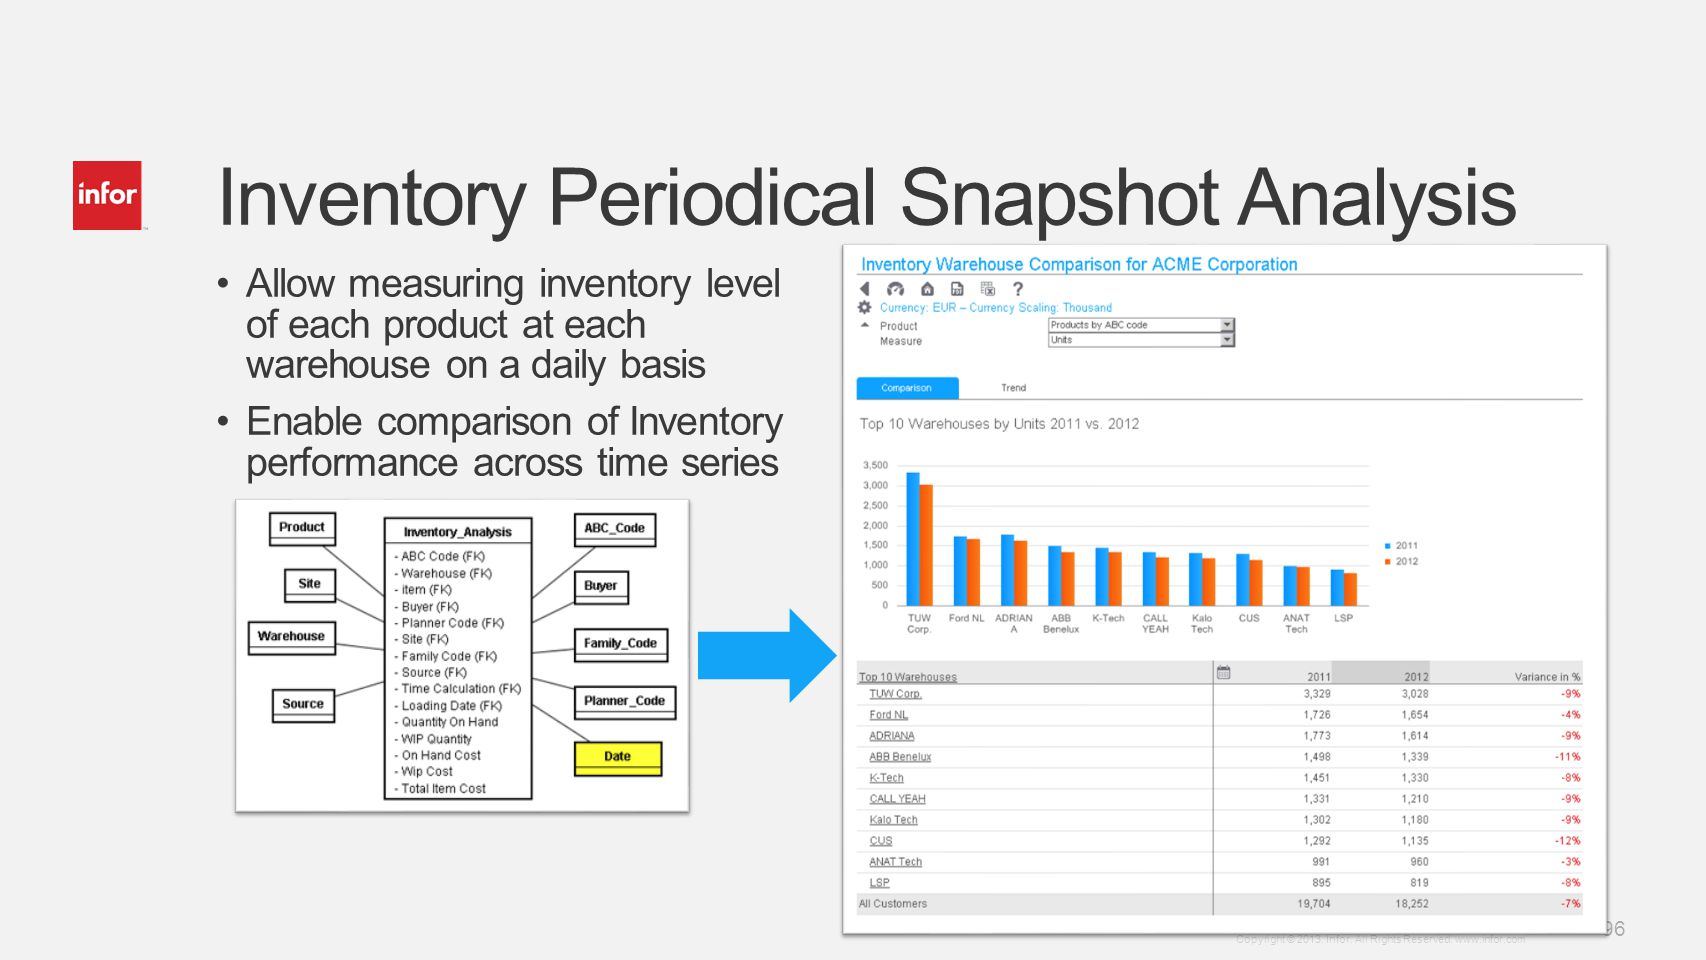 Inventory Periodical Snapshot Analysis